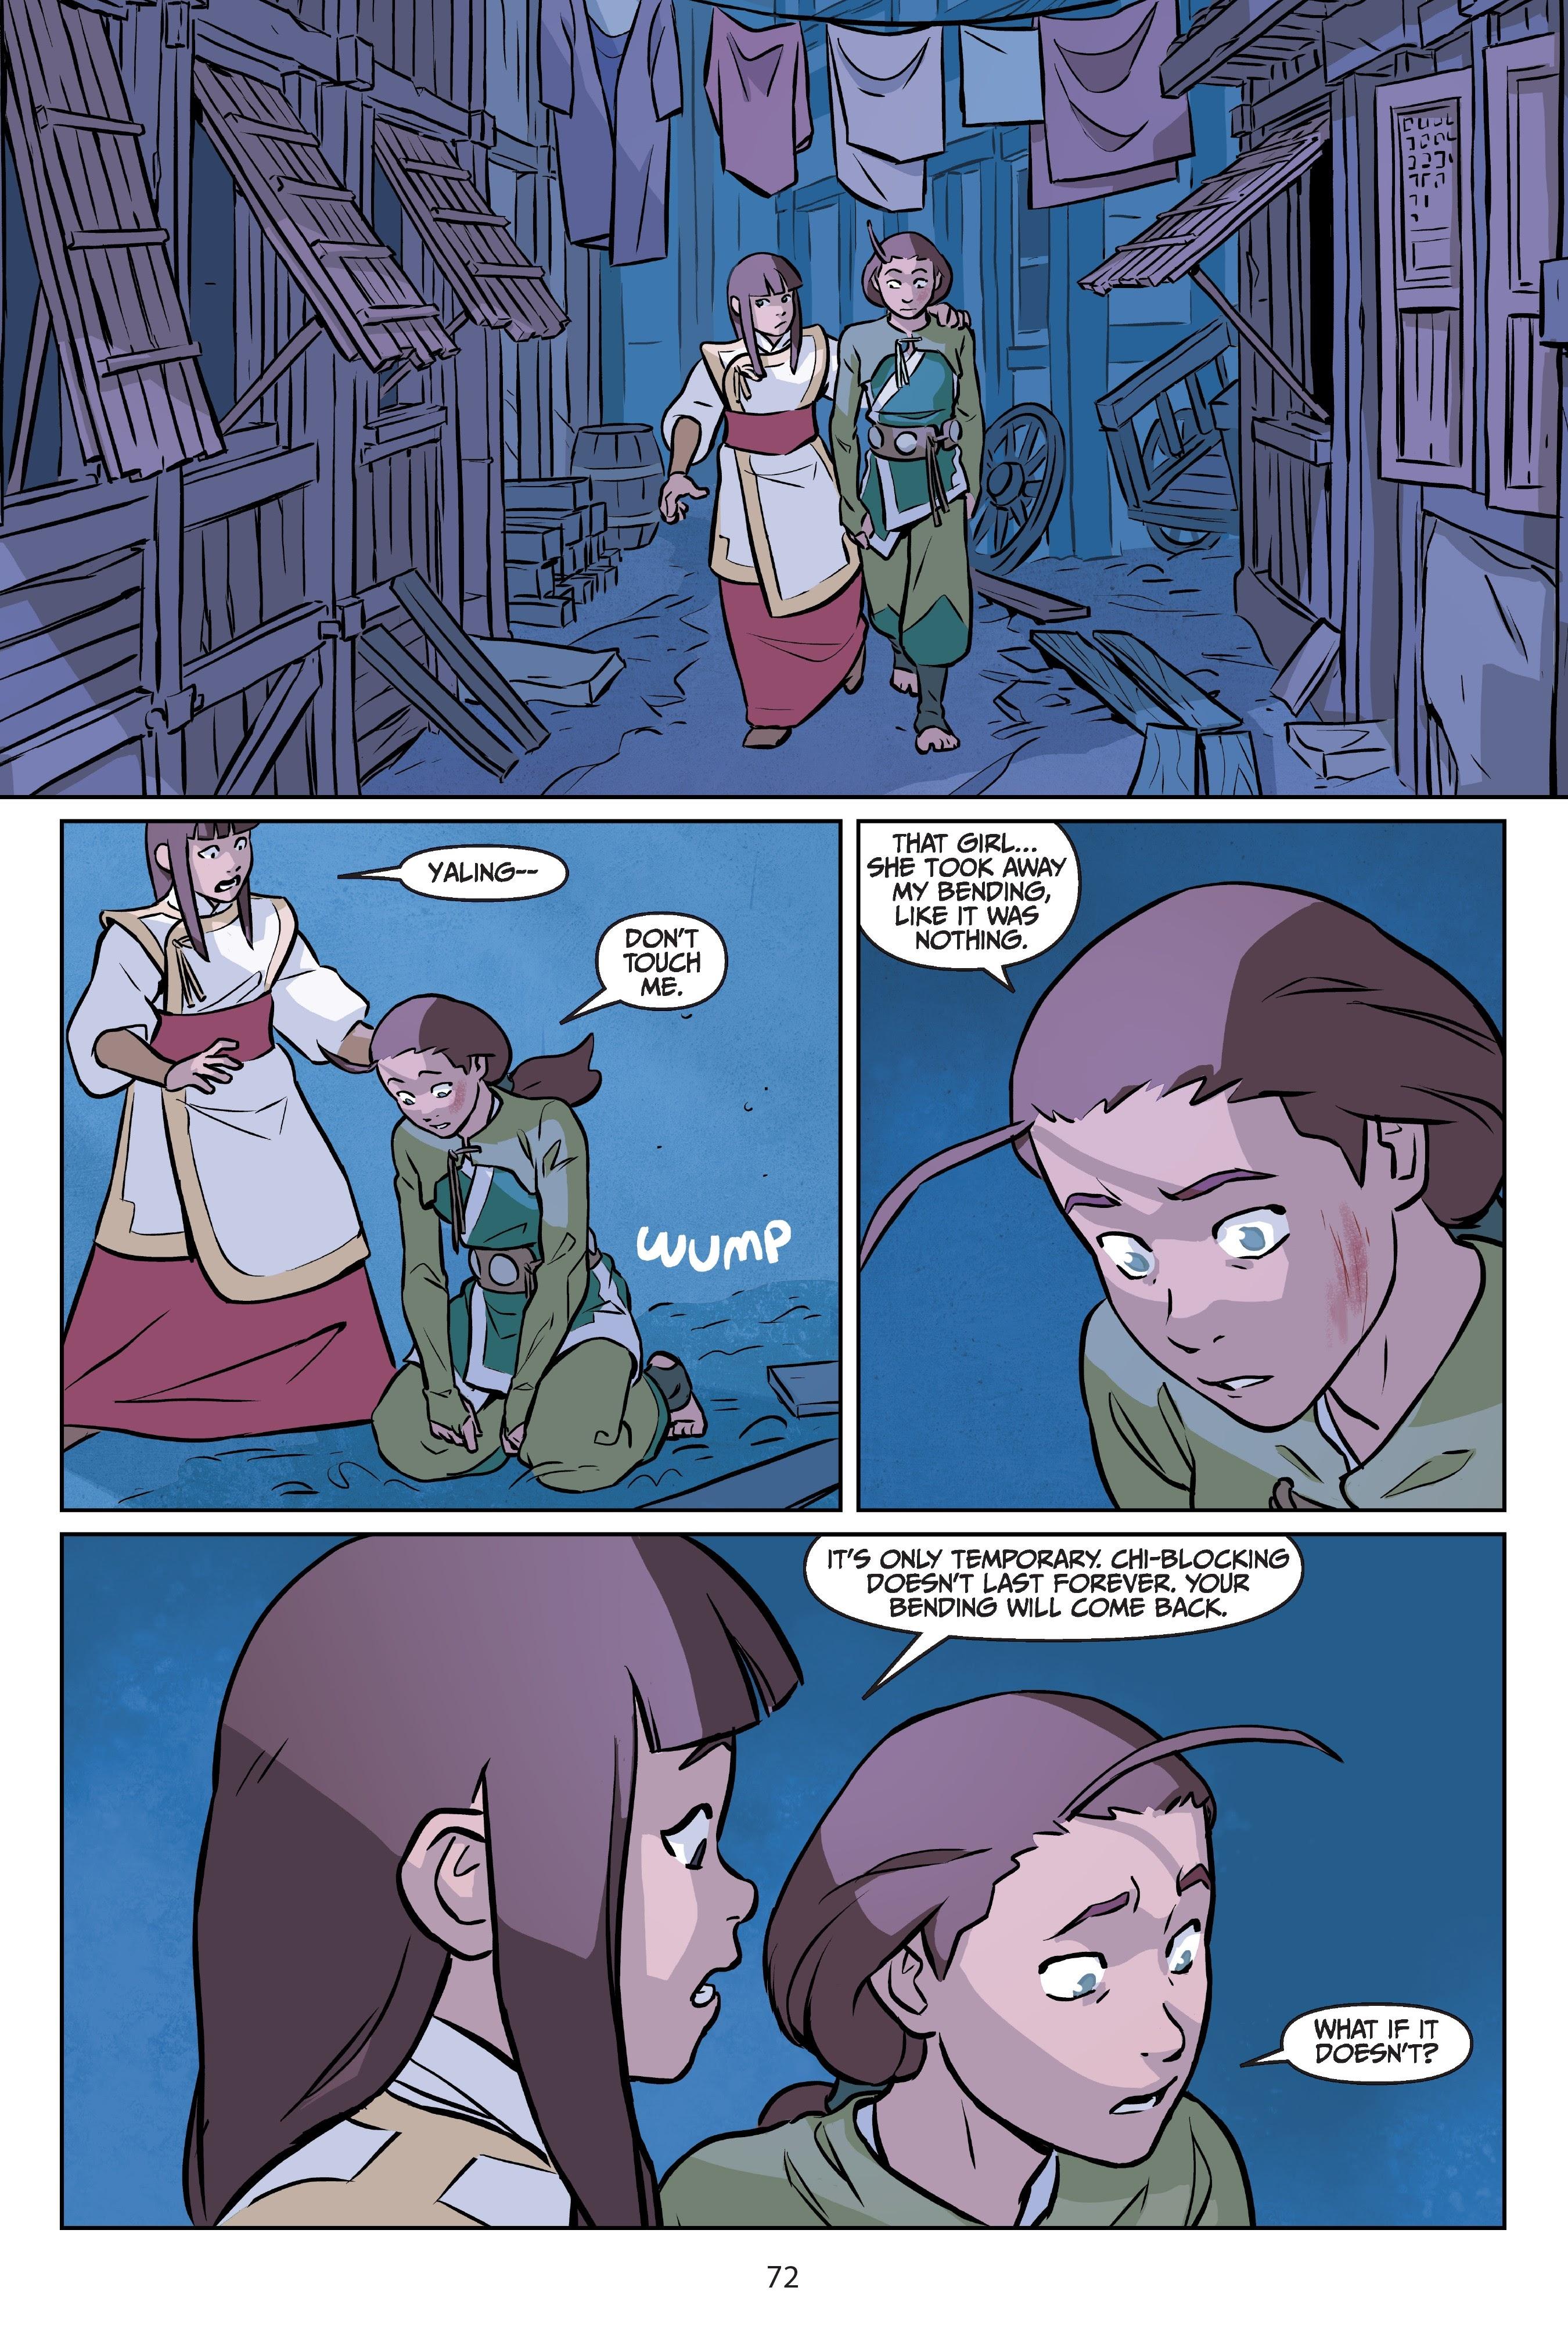 Nickelodeon Avatar: The Last Airbender - Imbalance TPB_2 Page 72